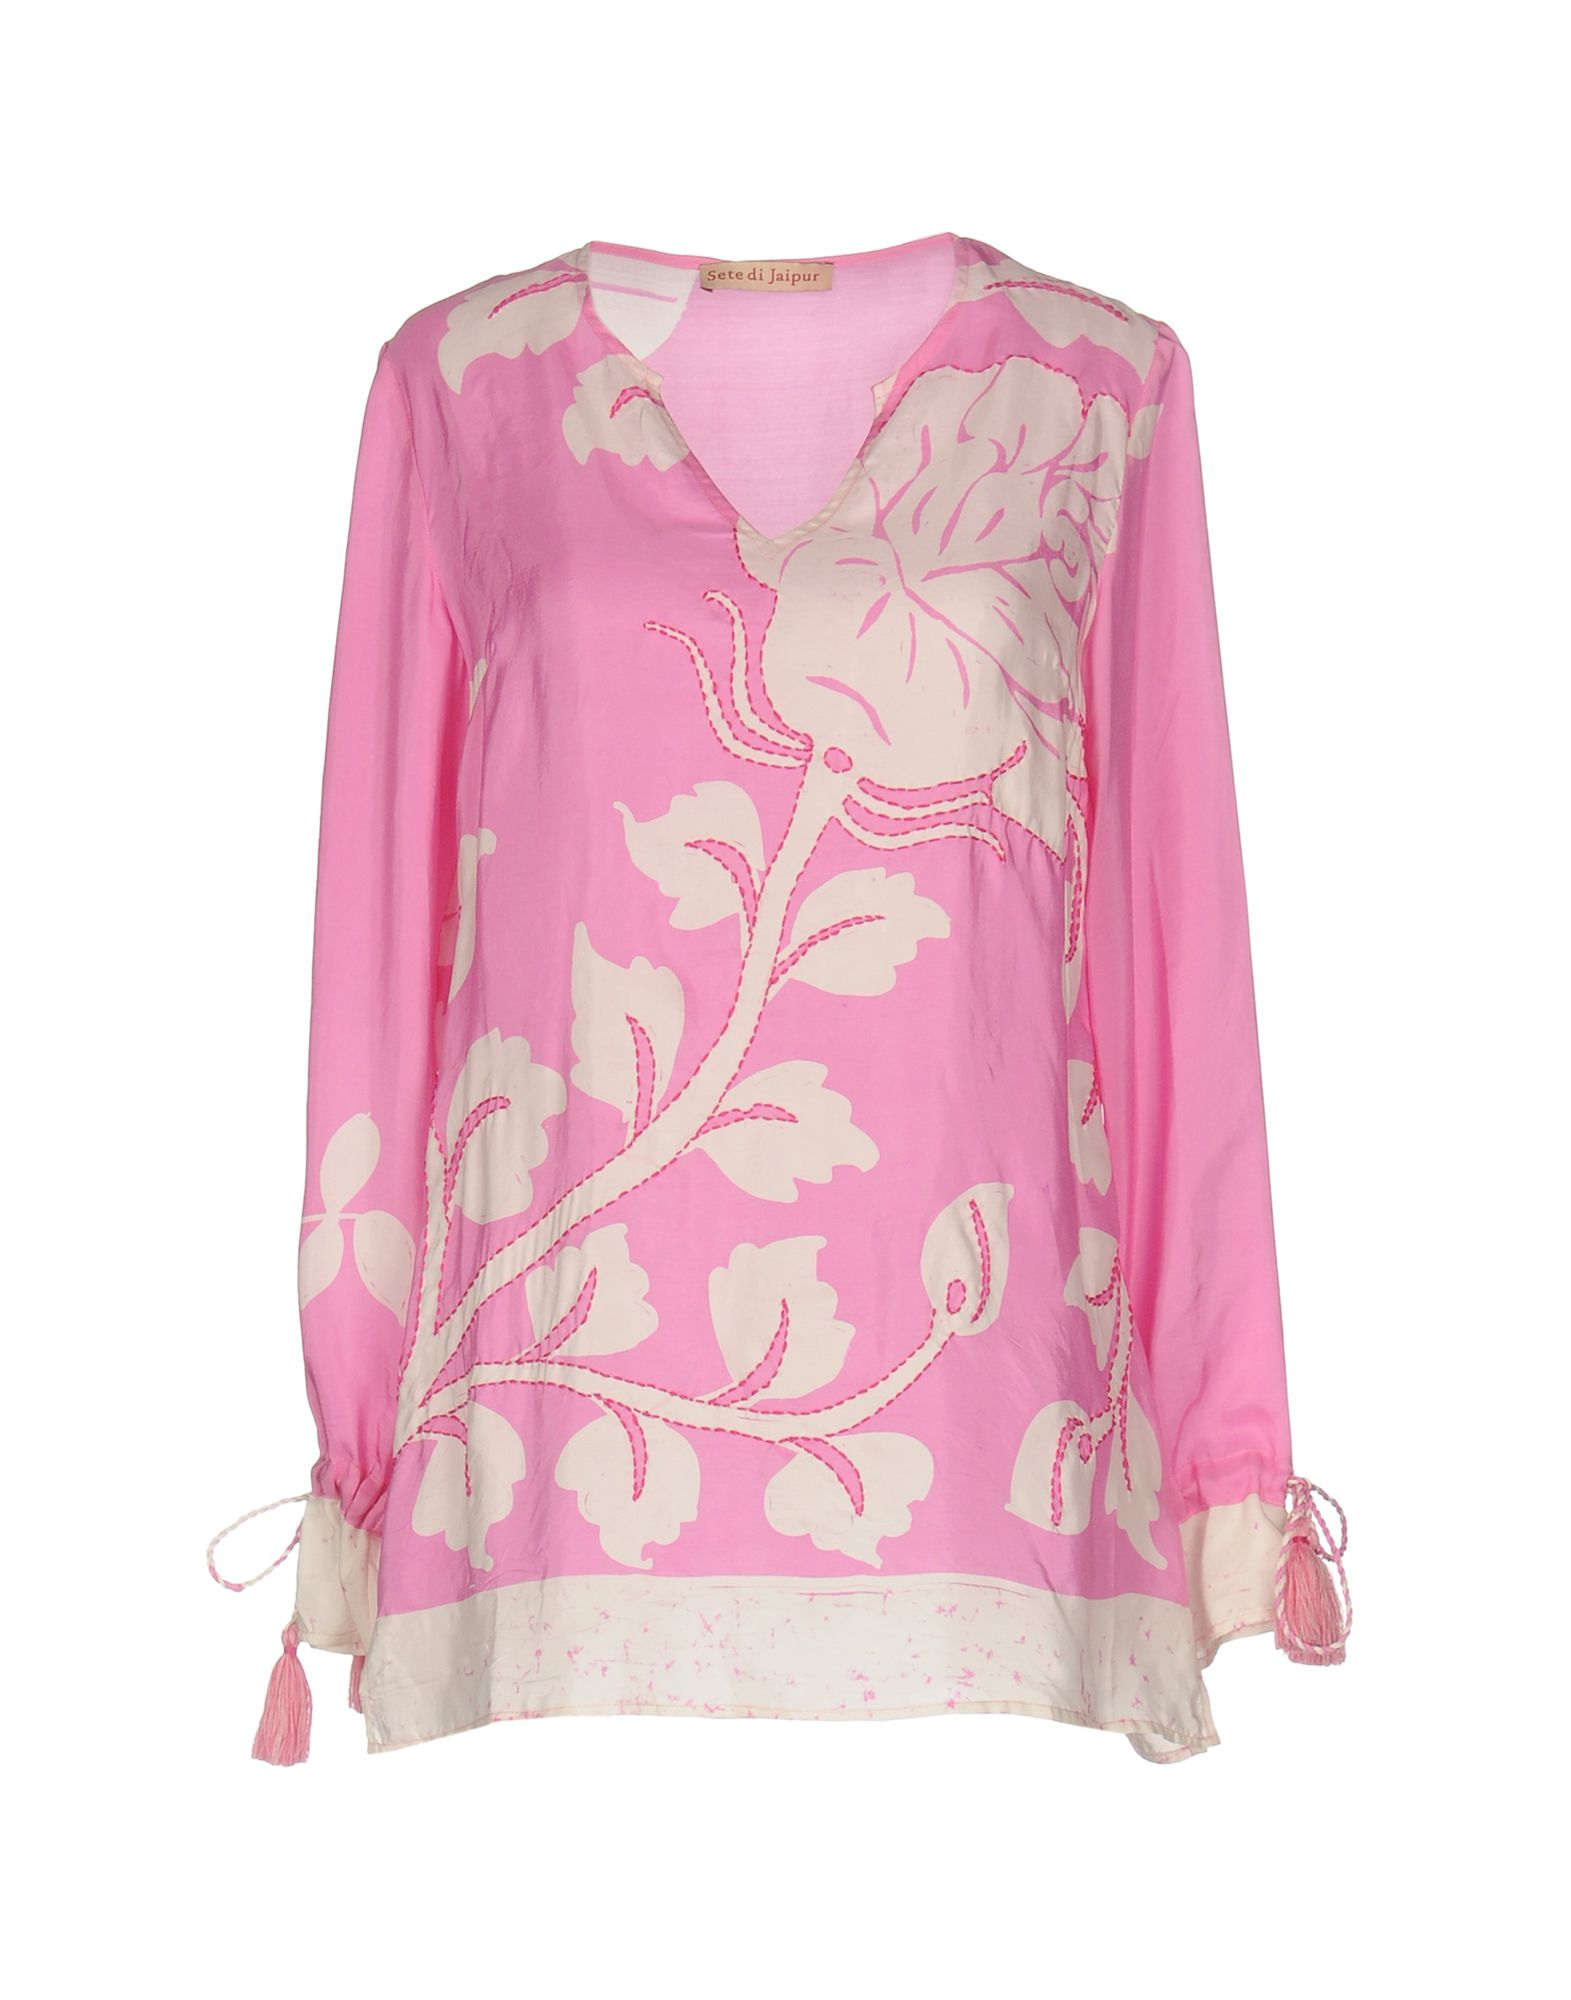 Blusa Sete Di Jaipur Donna - Acquista online su lM6e2nz